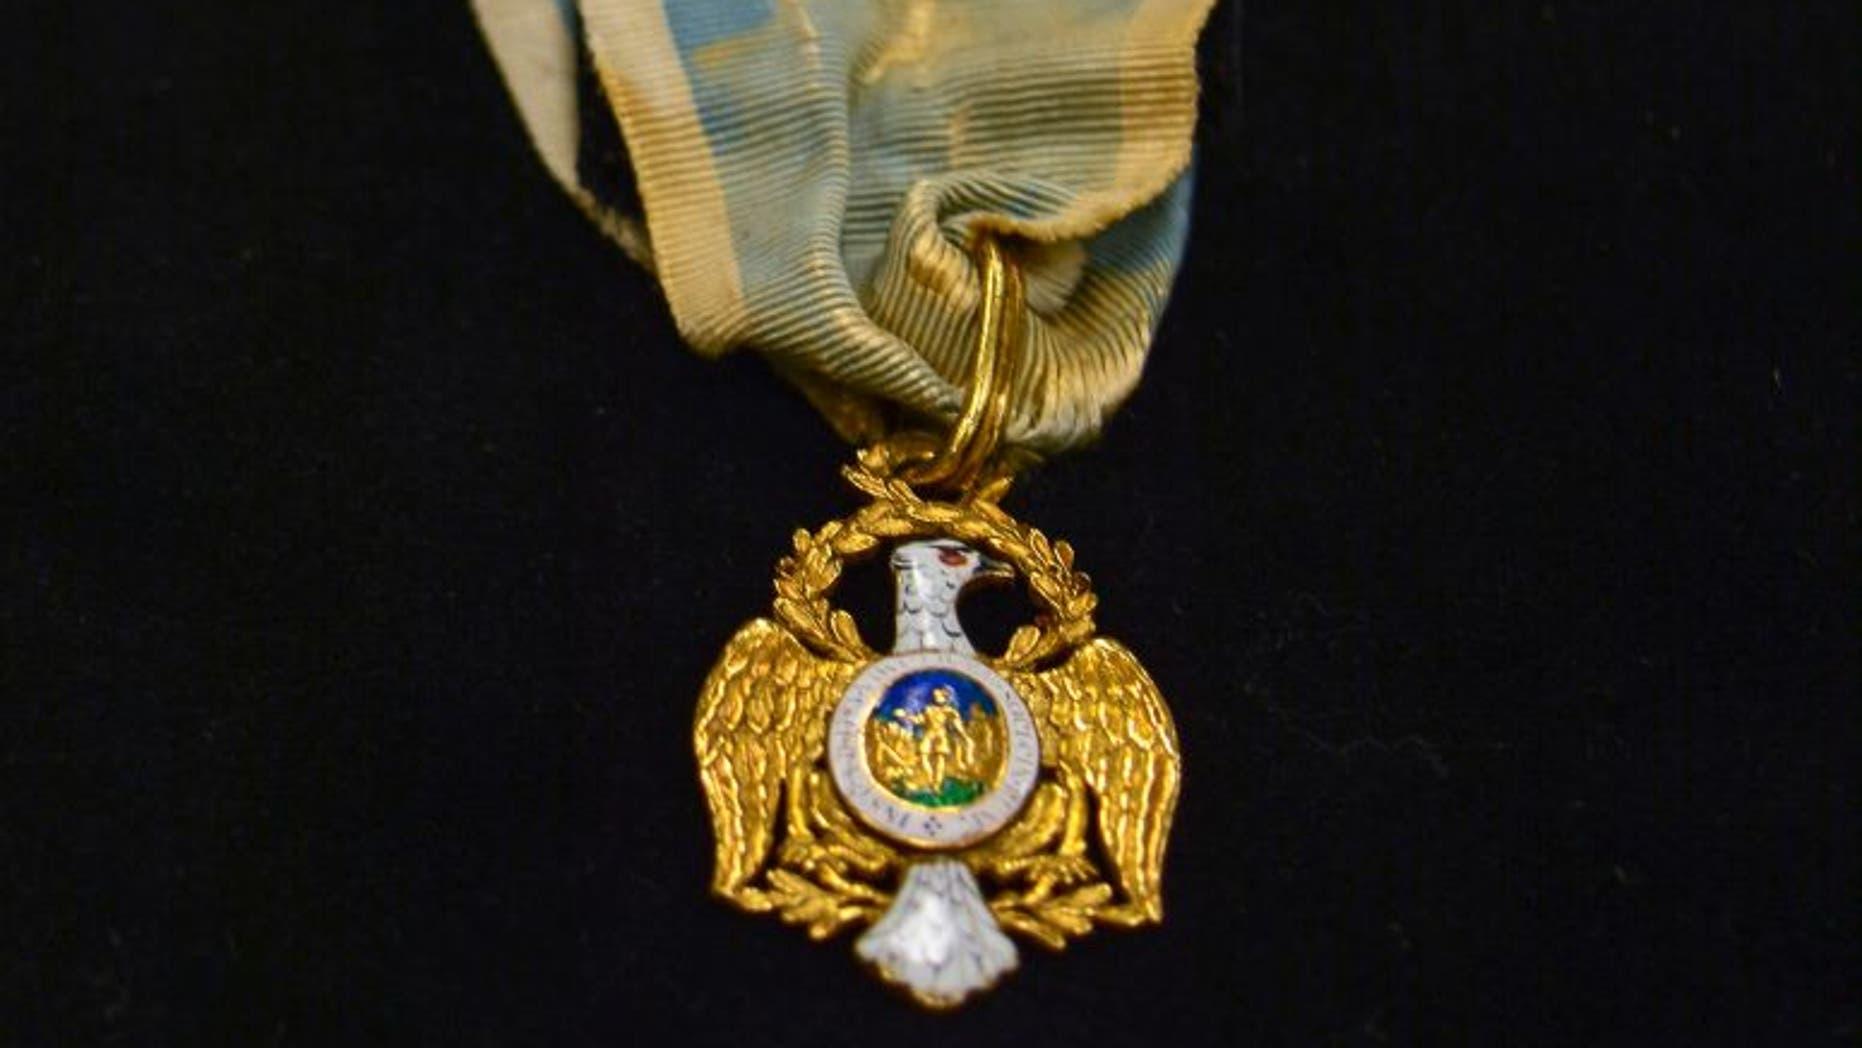 The Society of the Cincinnati Eagle insignia